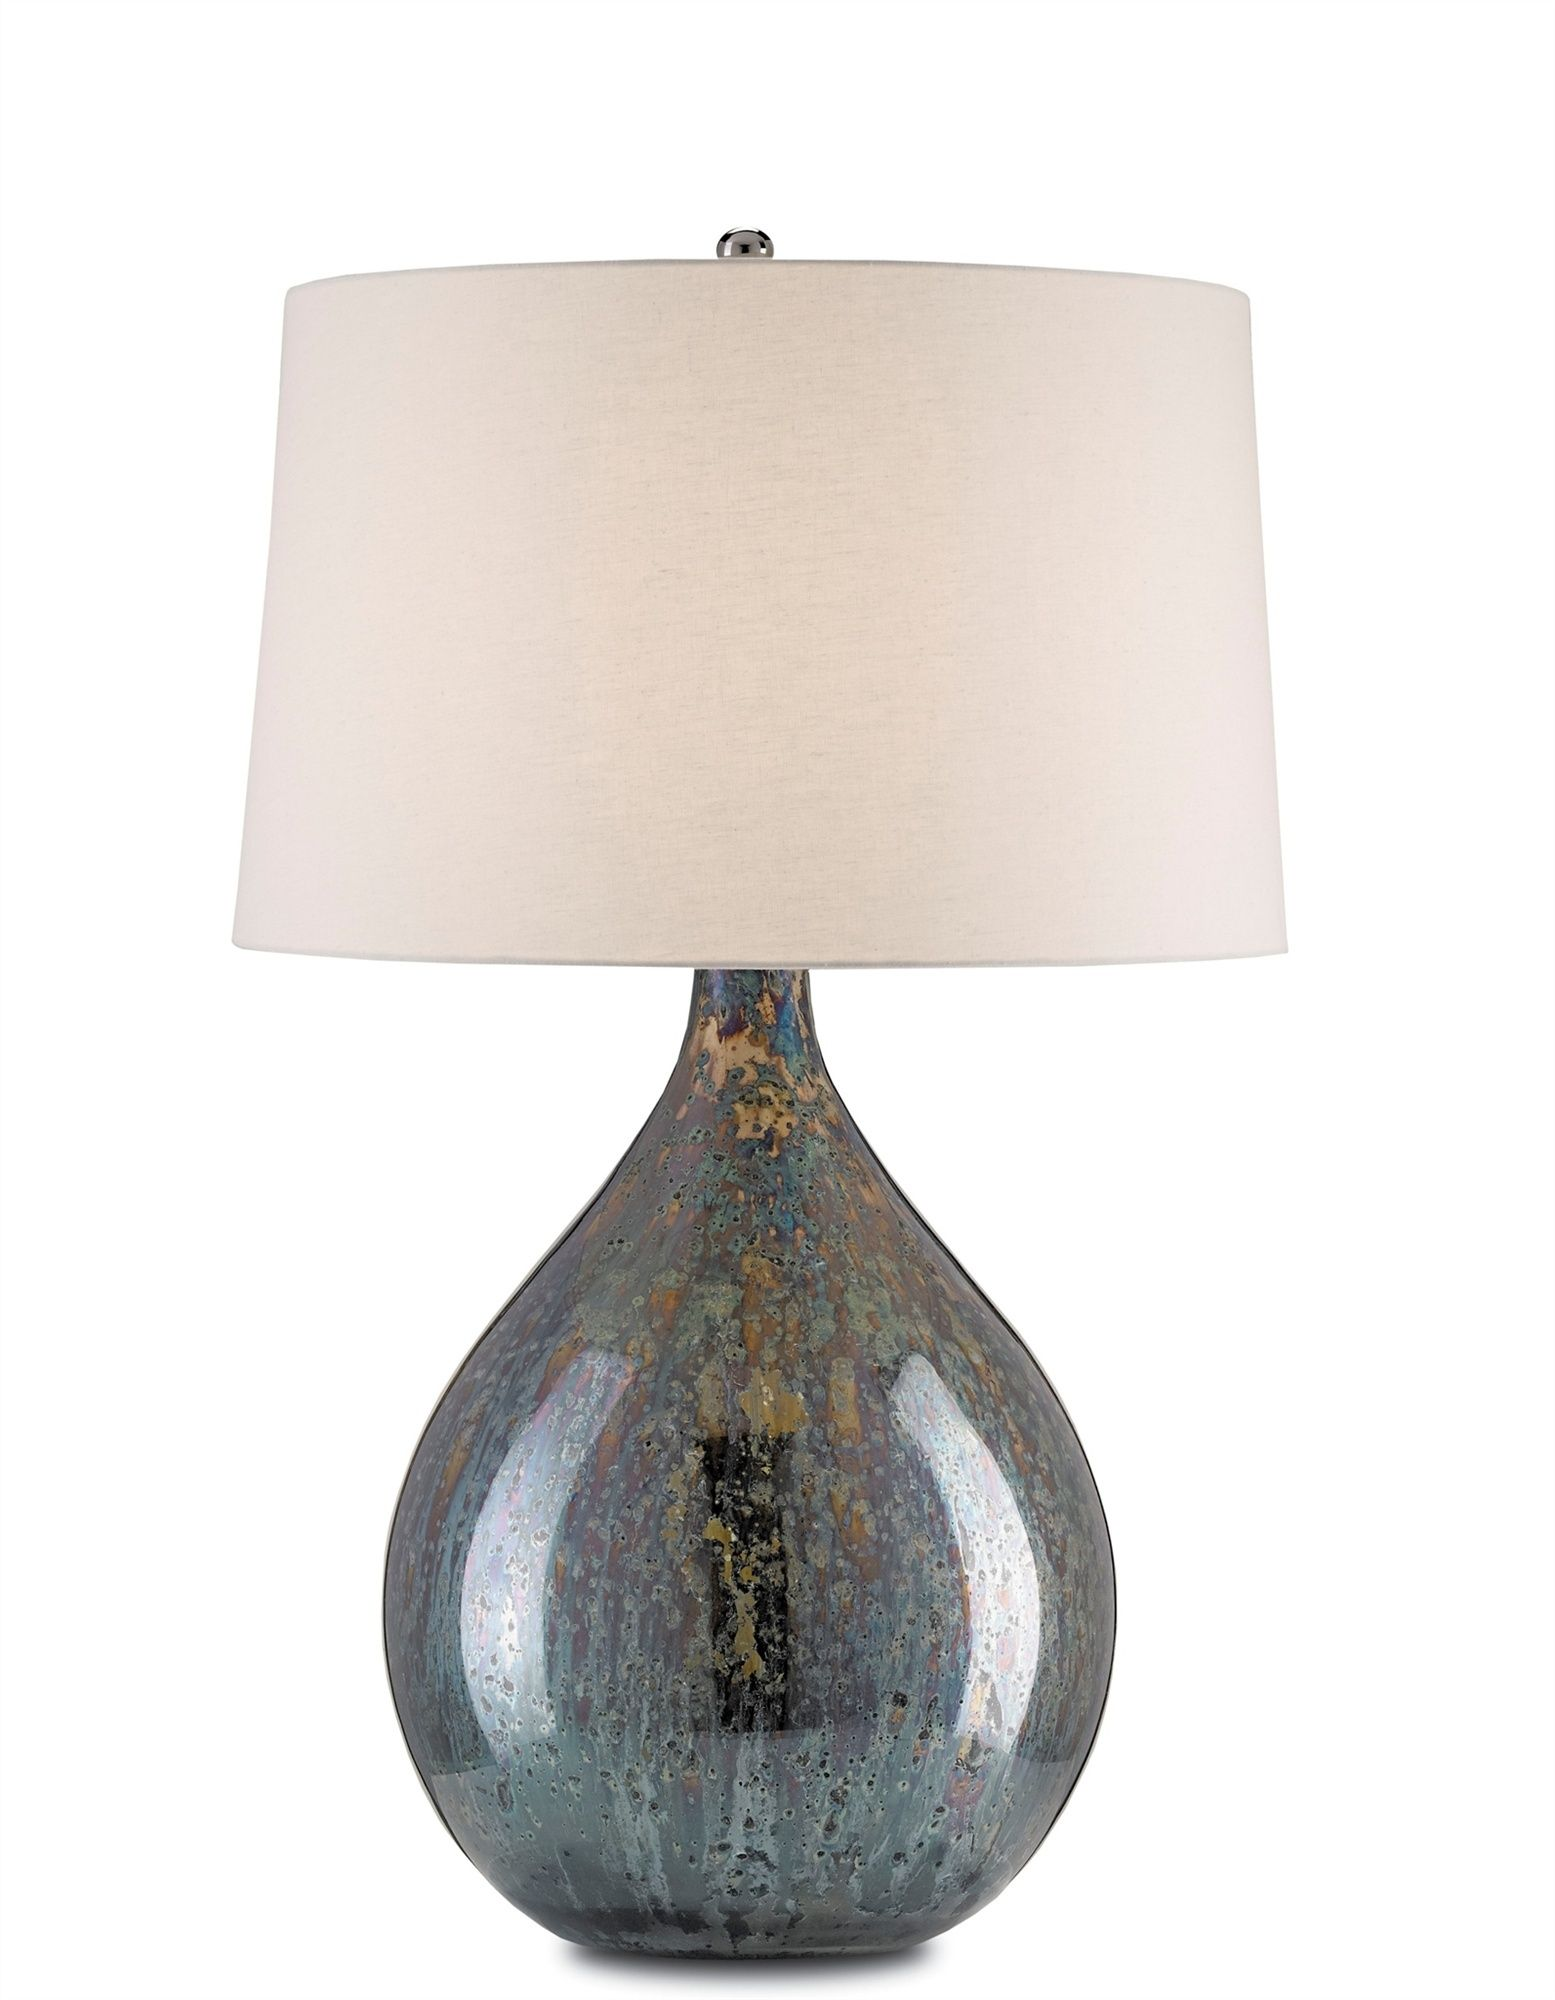 Blue Mercury Glass Lamp Mecox Interiordesign Home Decor Mercury Glass Lamp Mercury Glass Table Lamp Table Lamp